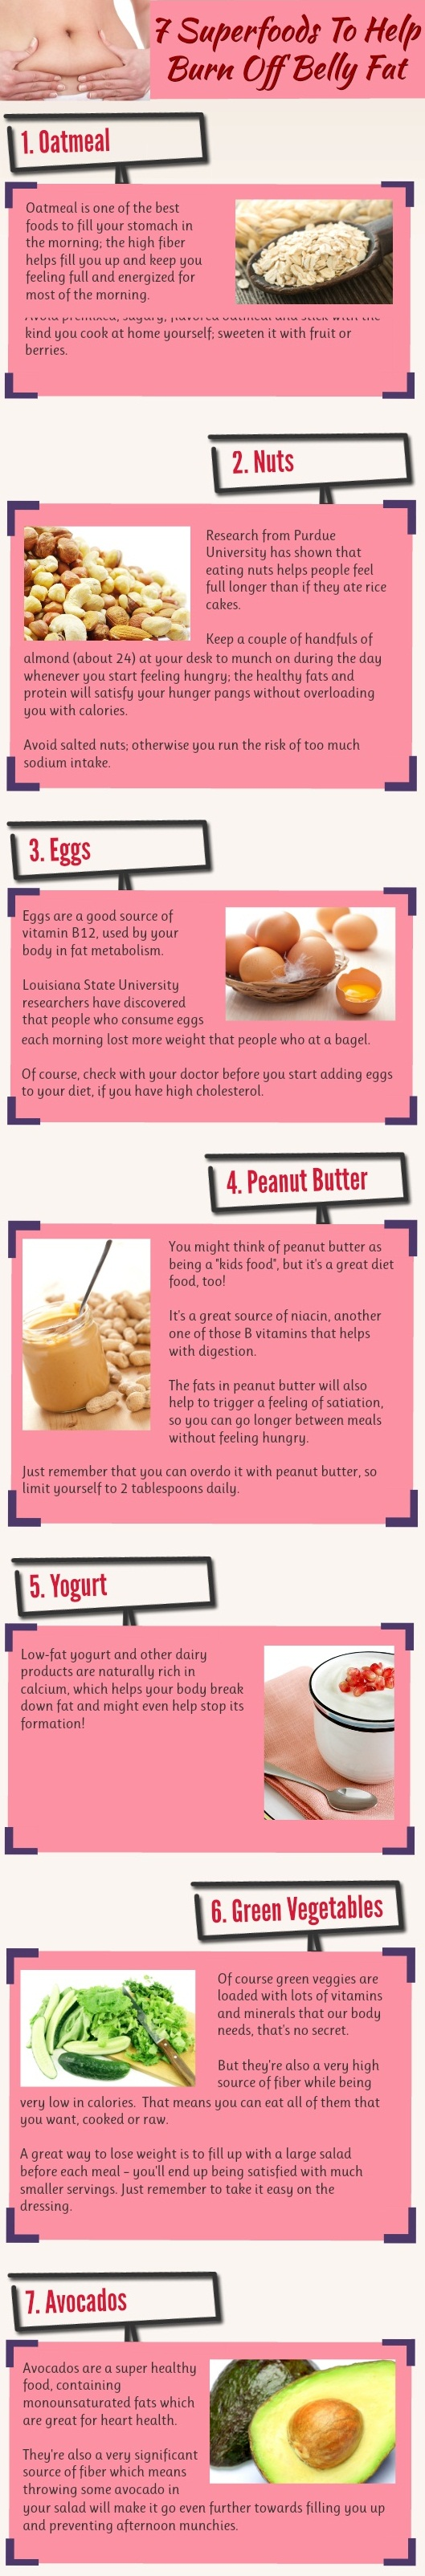 Easy paleo diet menu plan photo 3